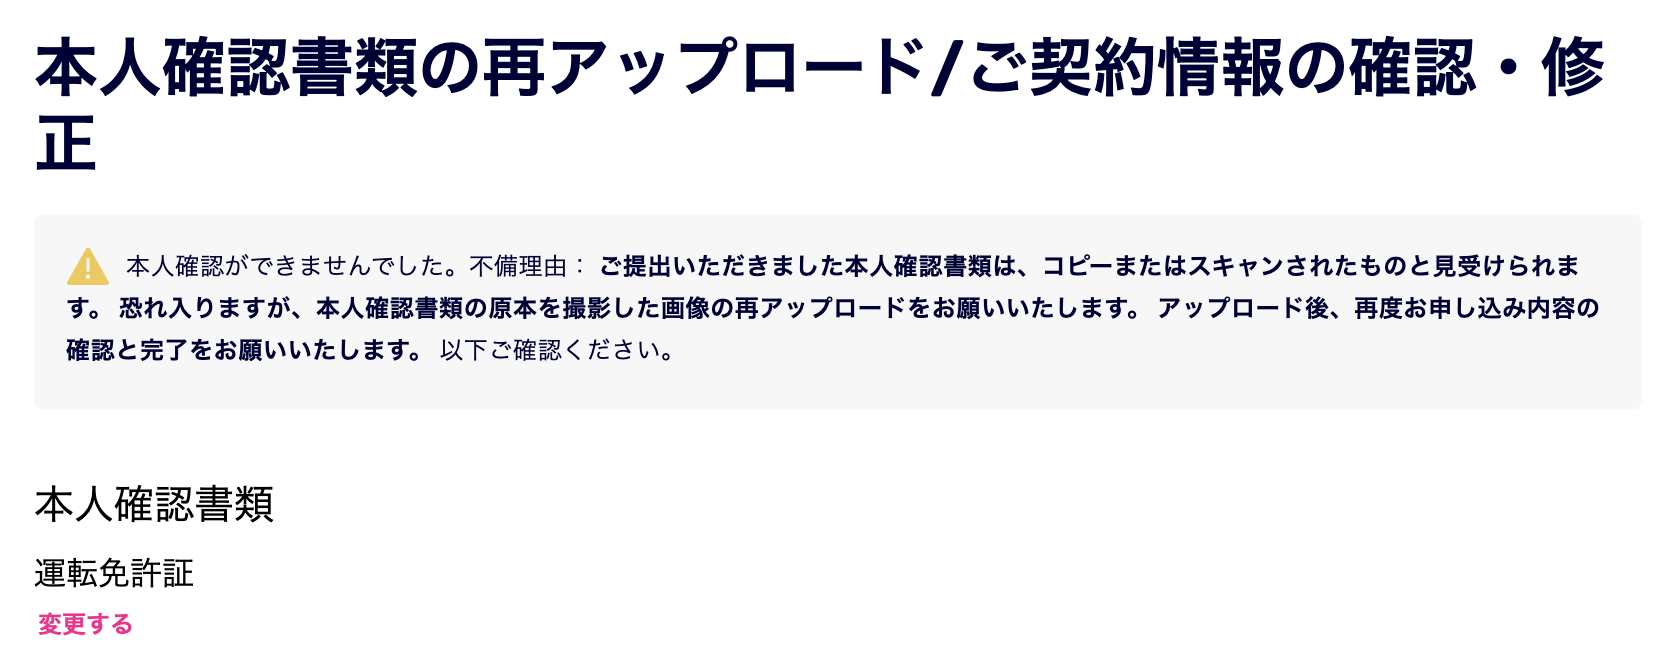 f:id:atsuhiro-me:20200601184936p:plain